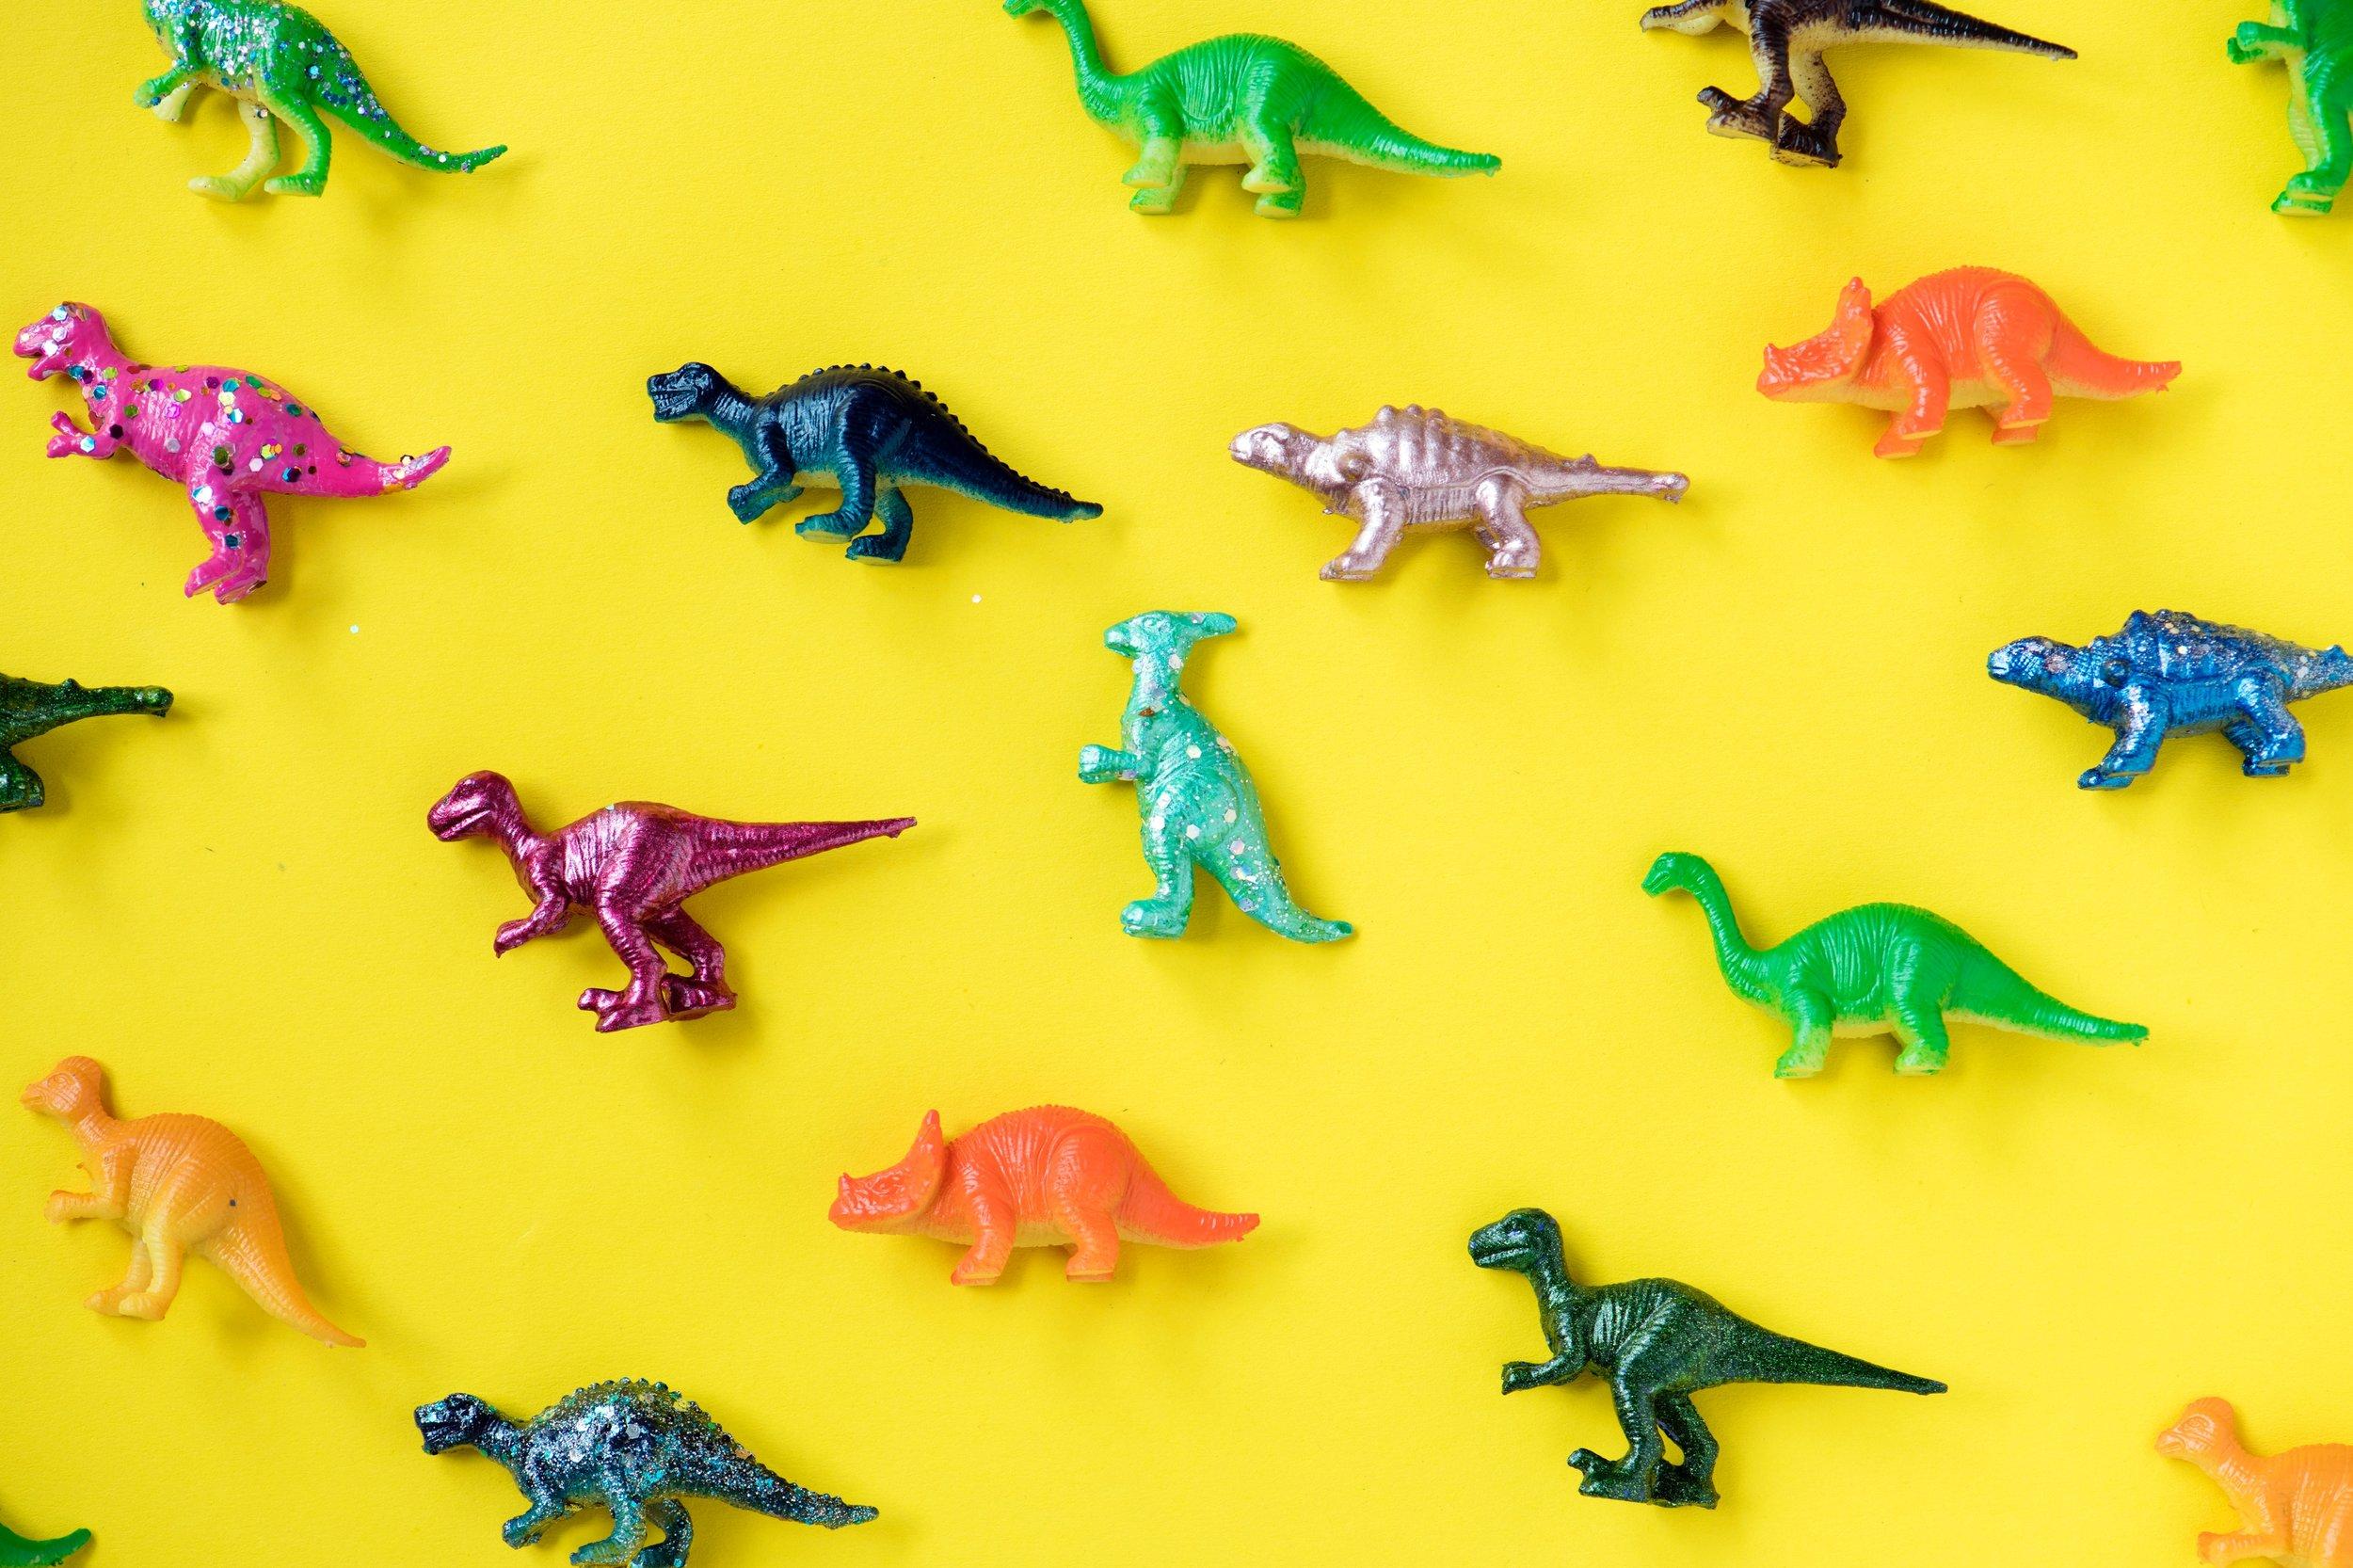 dinosaurs, toys